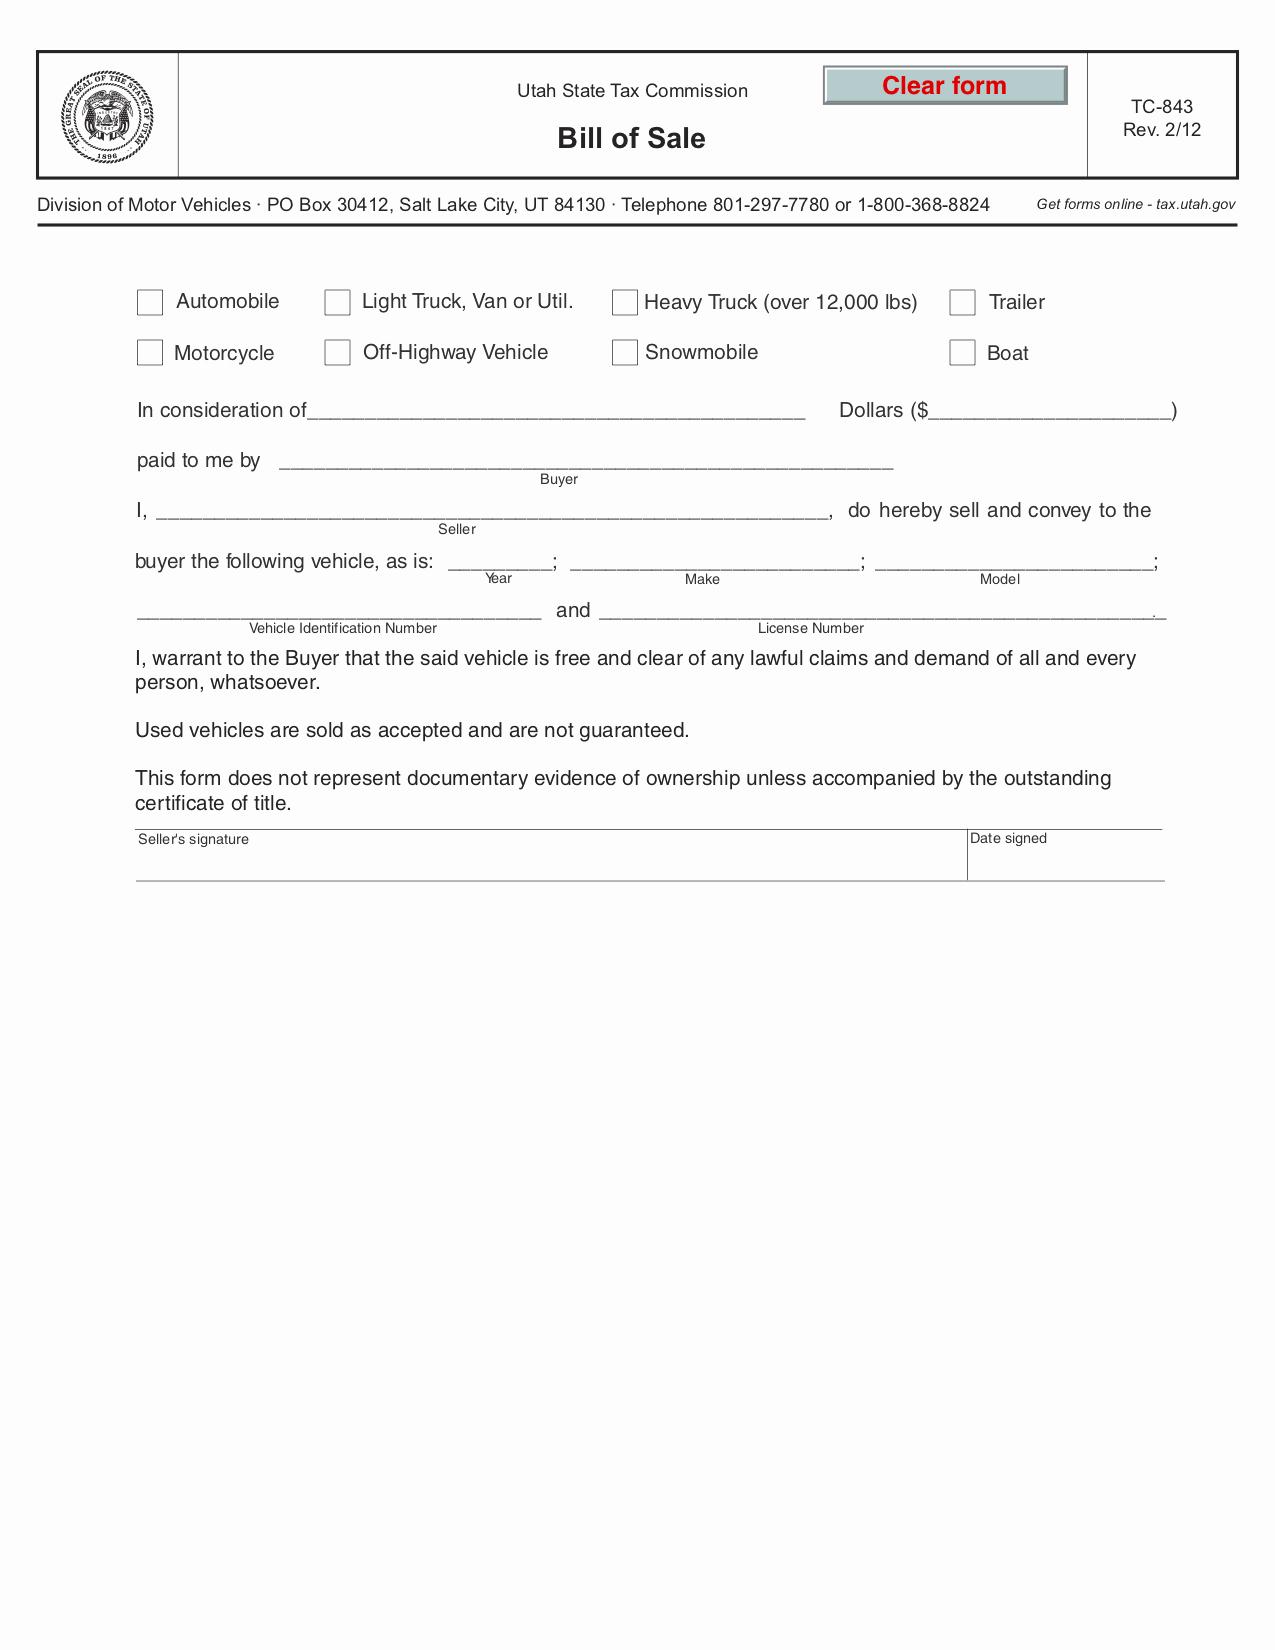 Automobile Bill Of Sale Illinois Luxury Free Utah Bill Of Sale form Pdf Template